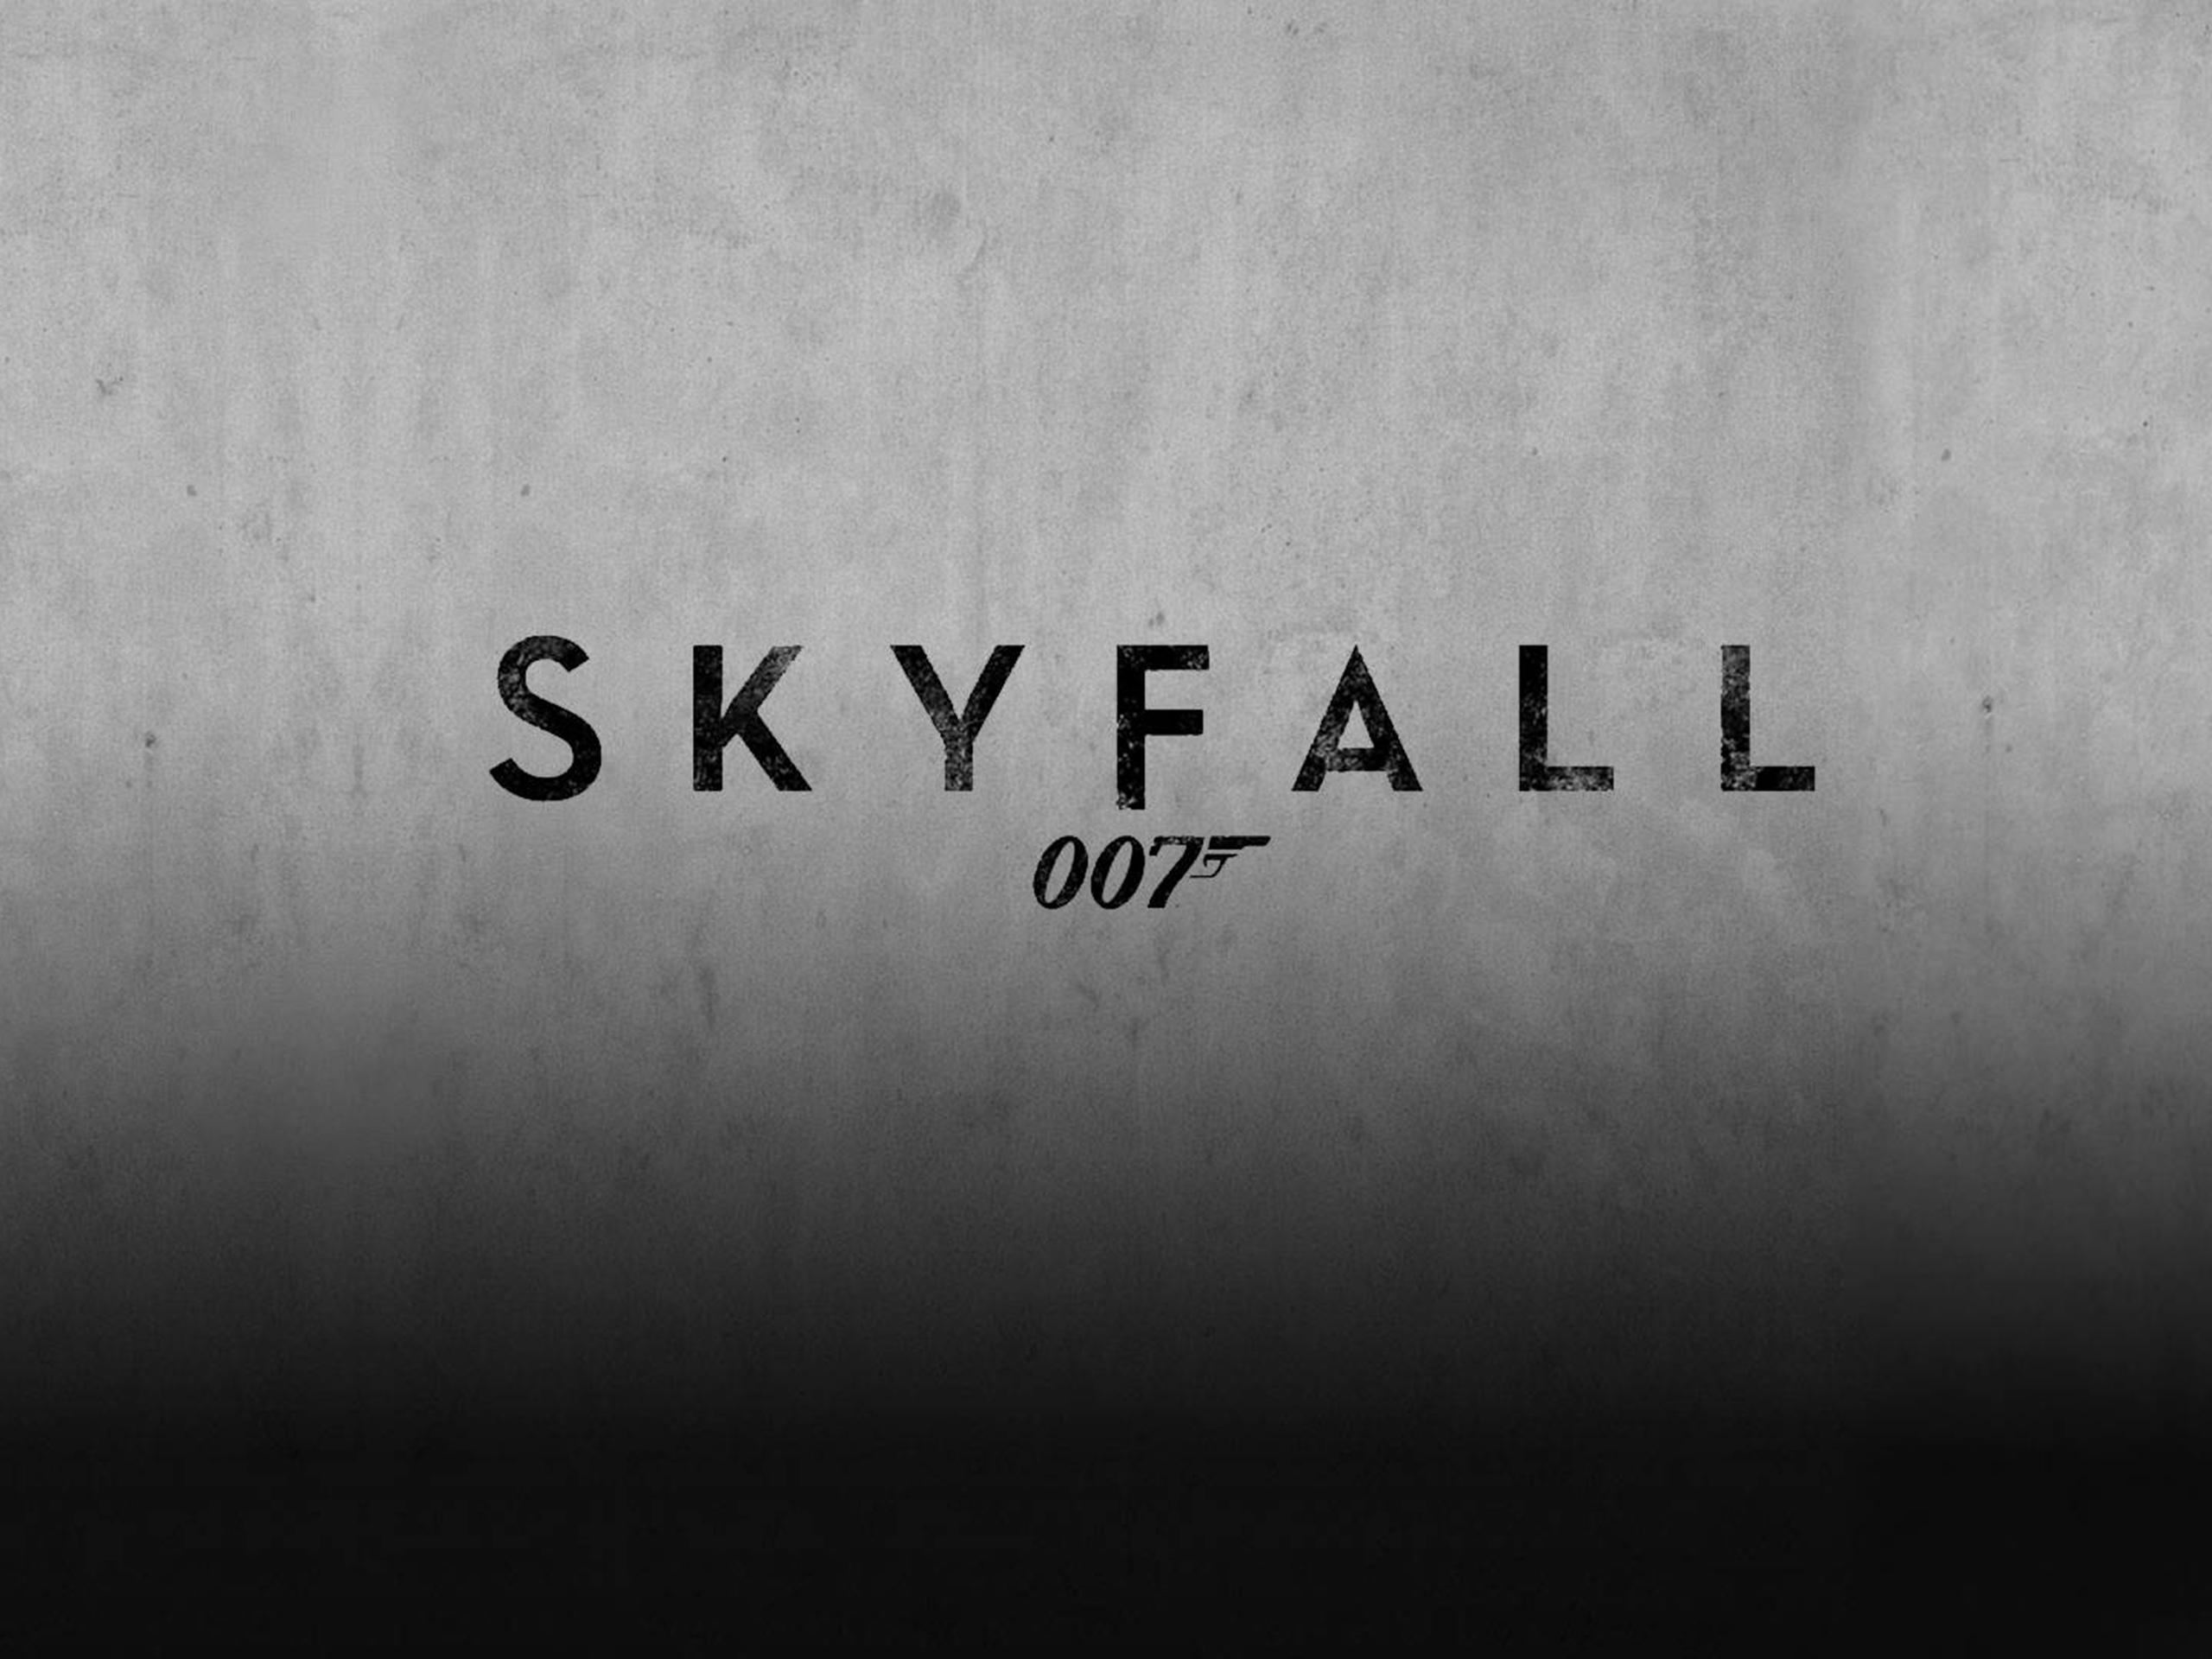 skyfall james bond movie | free desktop wallpapers for widescreen